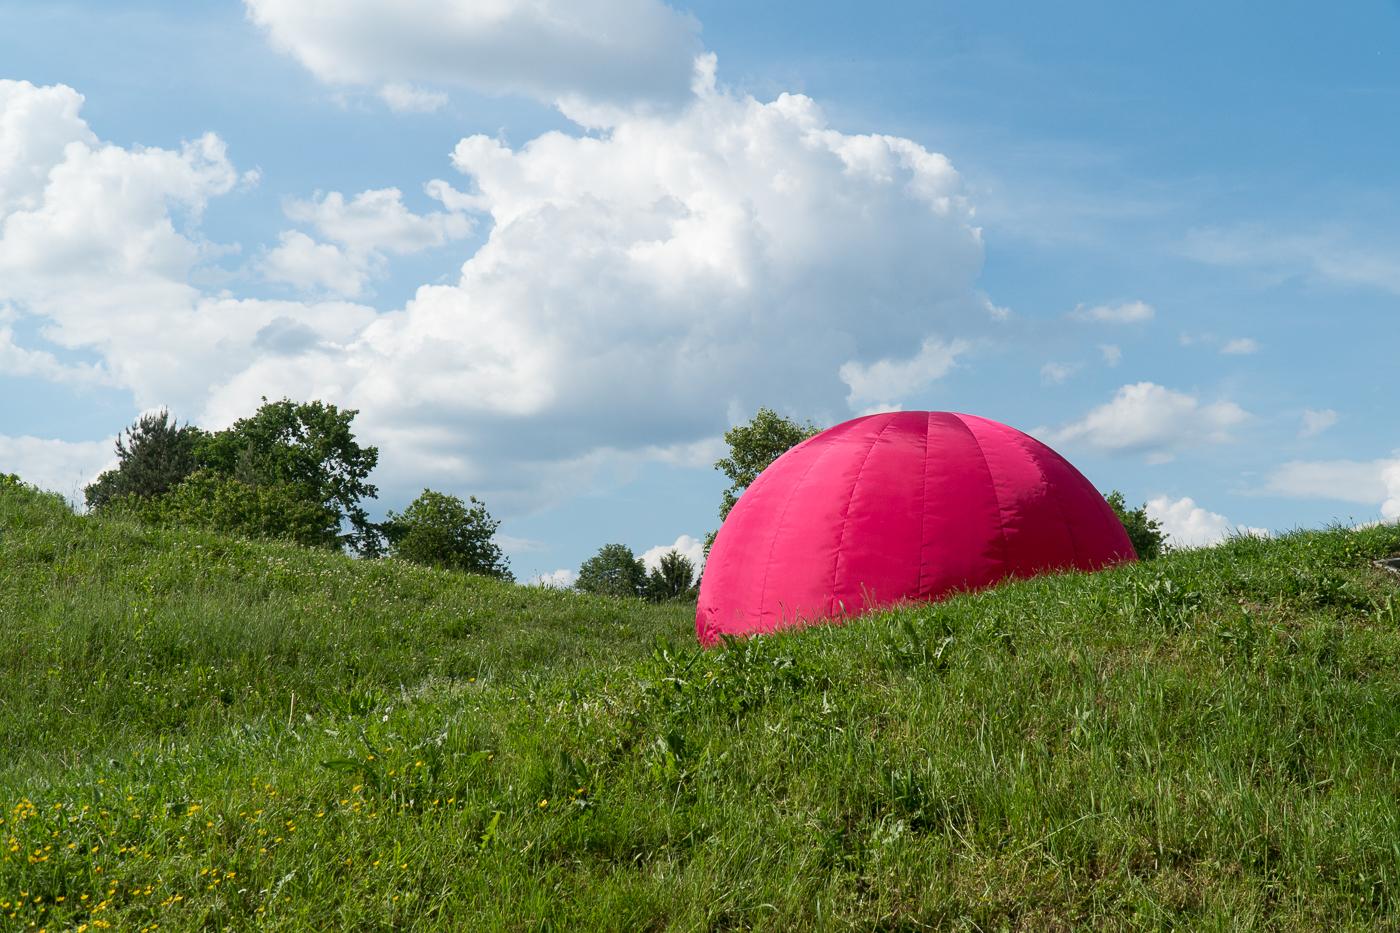 Art moderne, boule rose qui gonfle